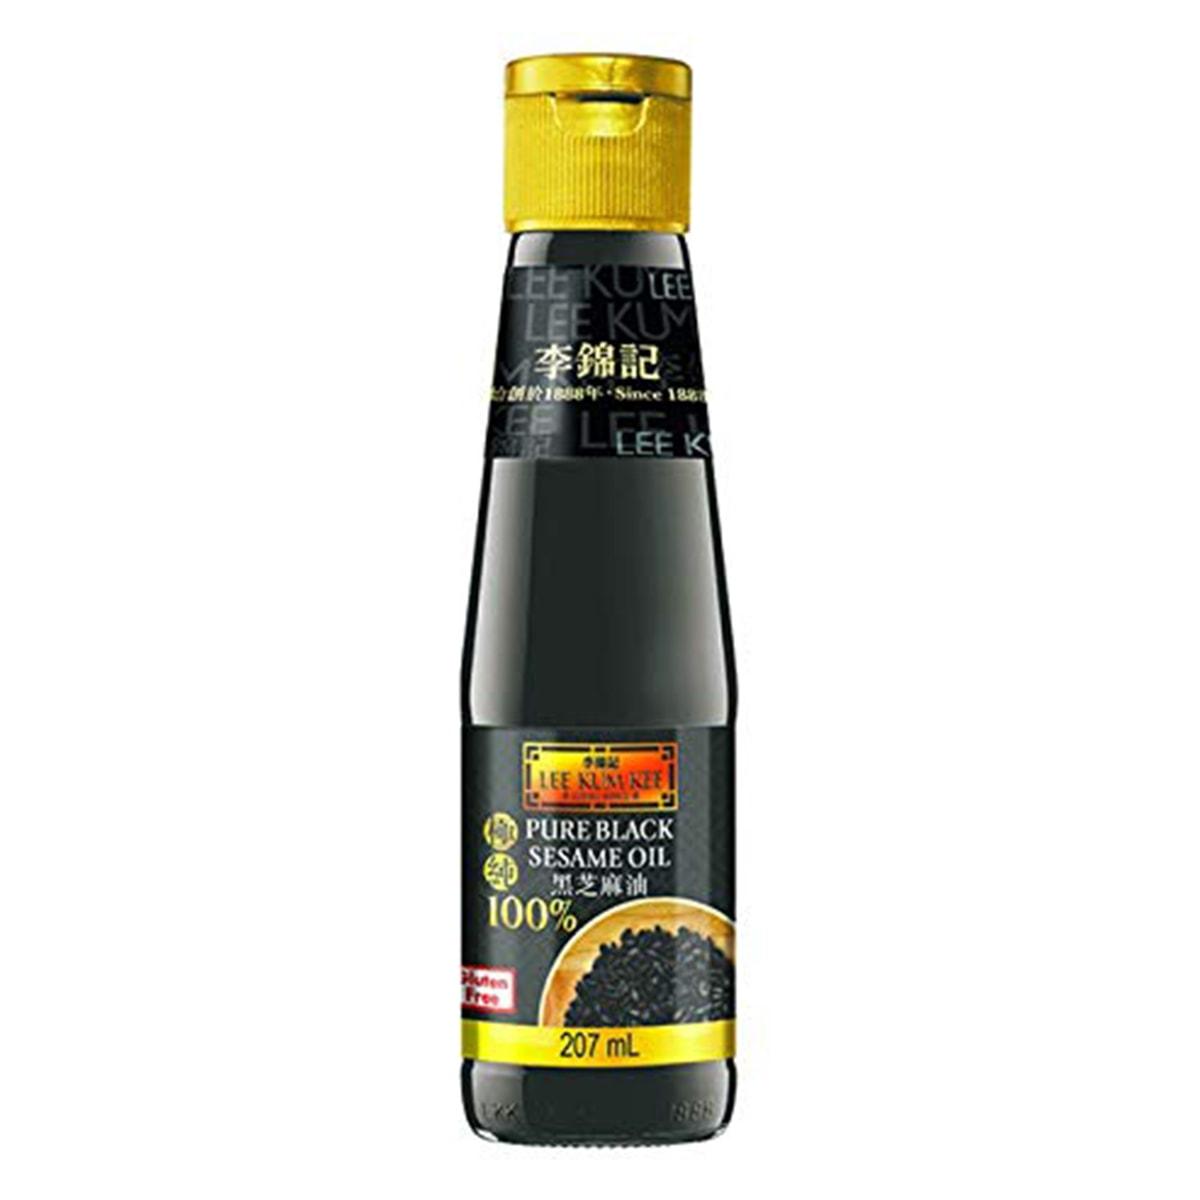 Buy Lee Kum Kee Pure Black Sesame Oil - 207 ml